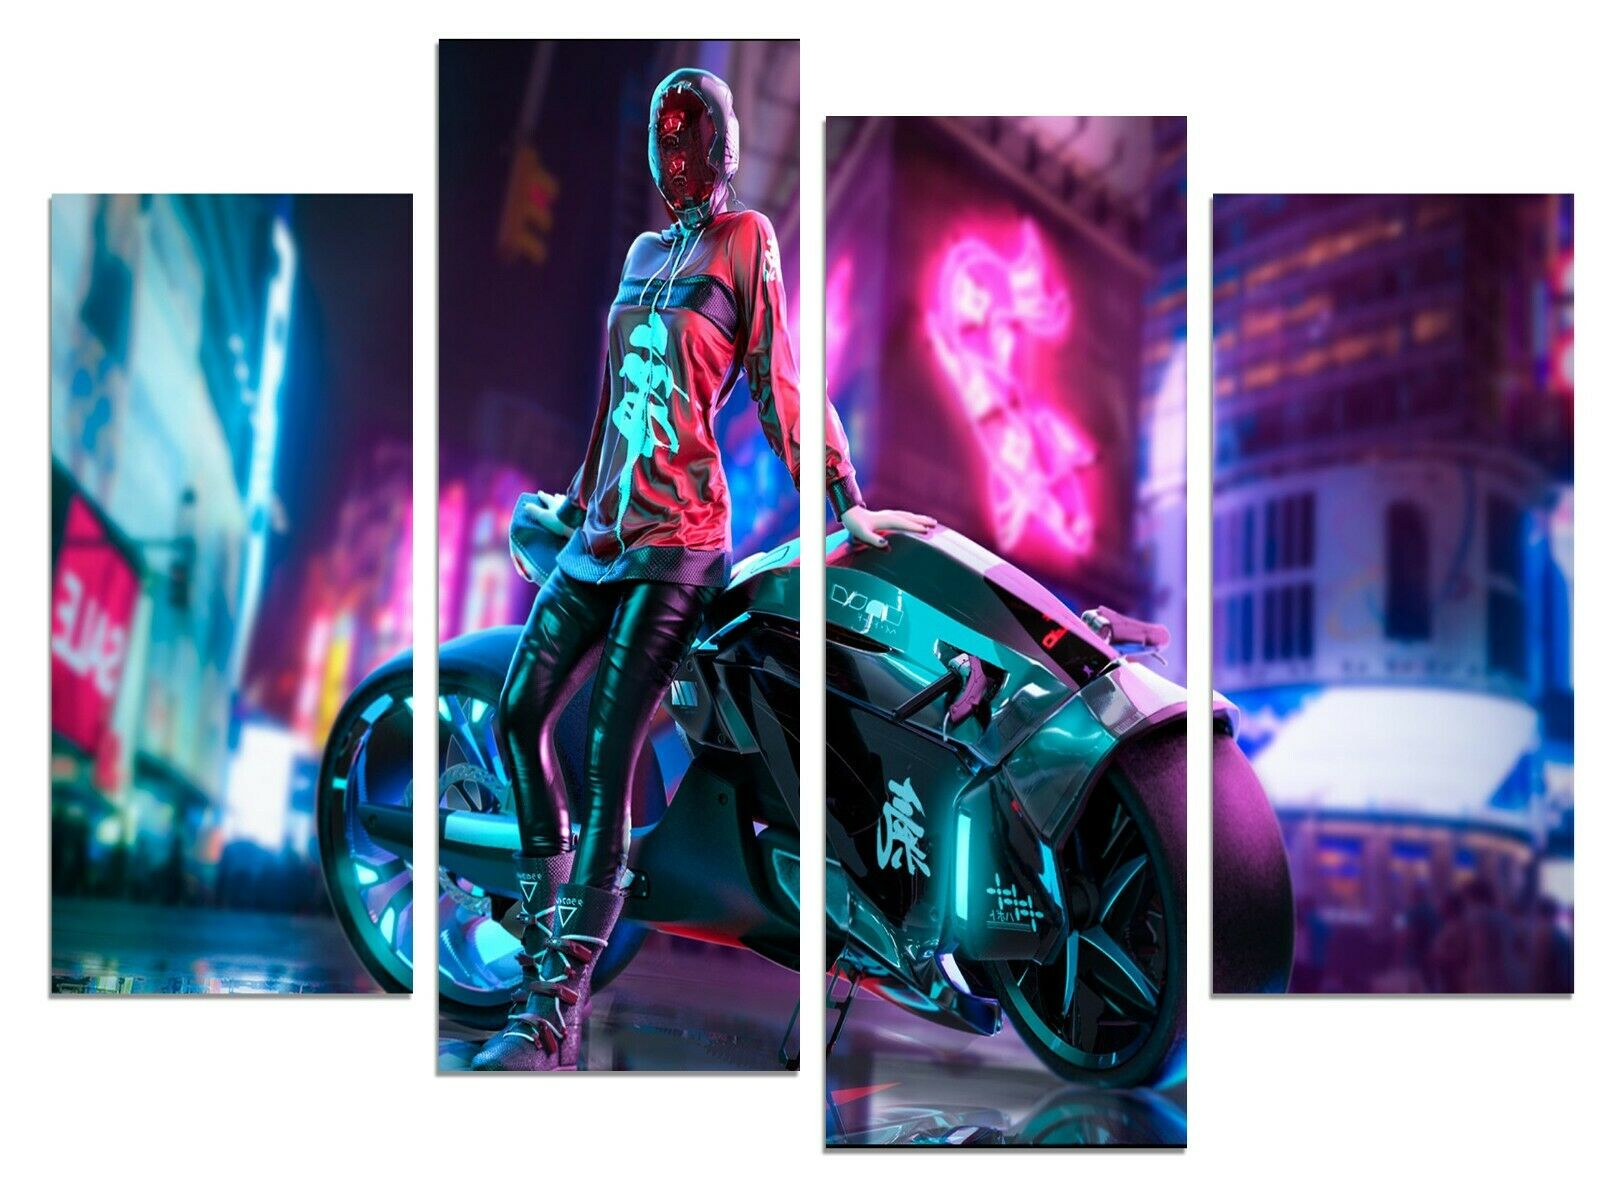 Cyberpunk sci-fi motorbike girl 56 x 43  canvas prints